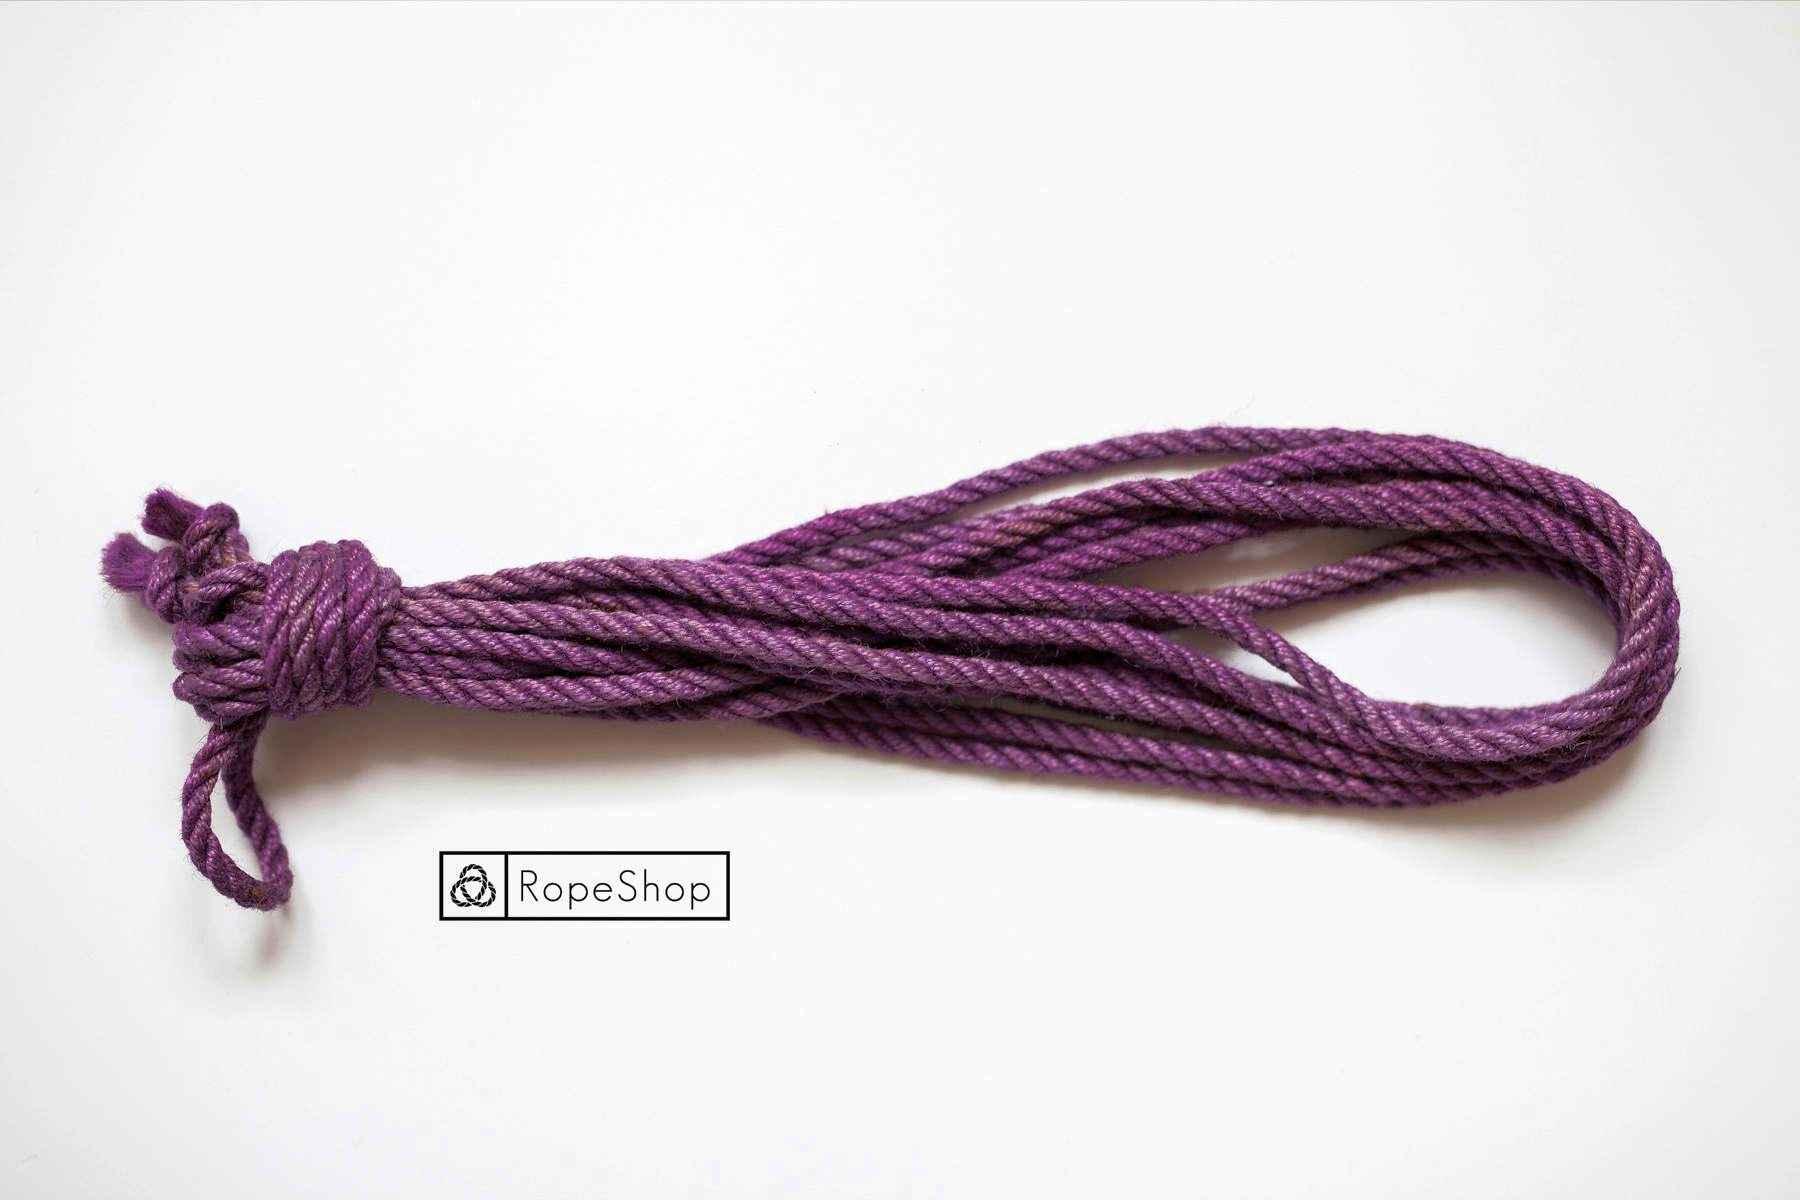 Джутовая веревка для шибари Korde